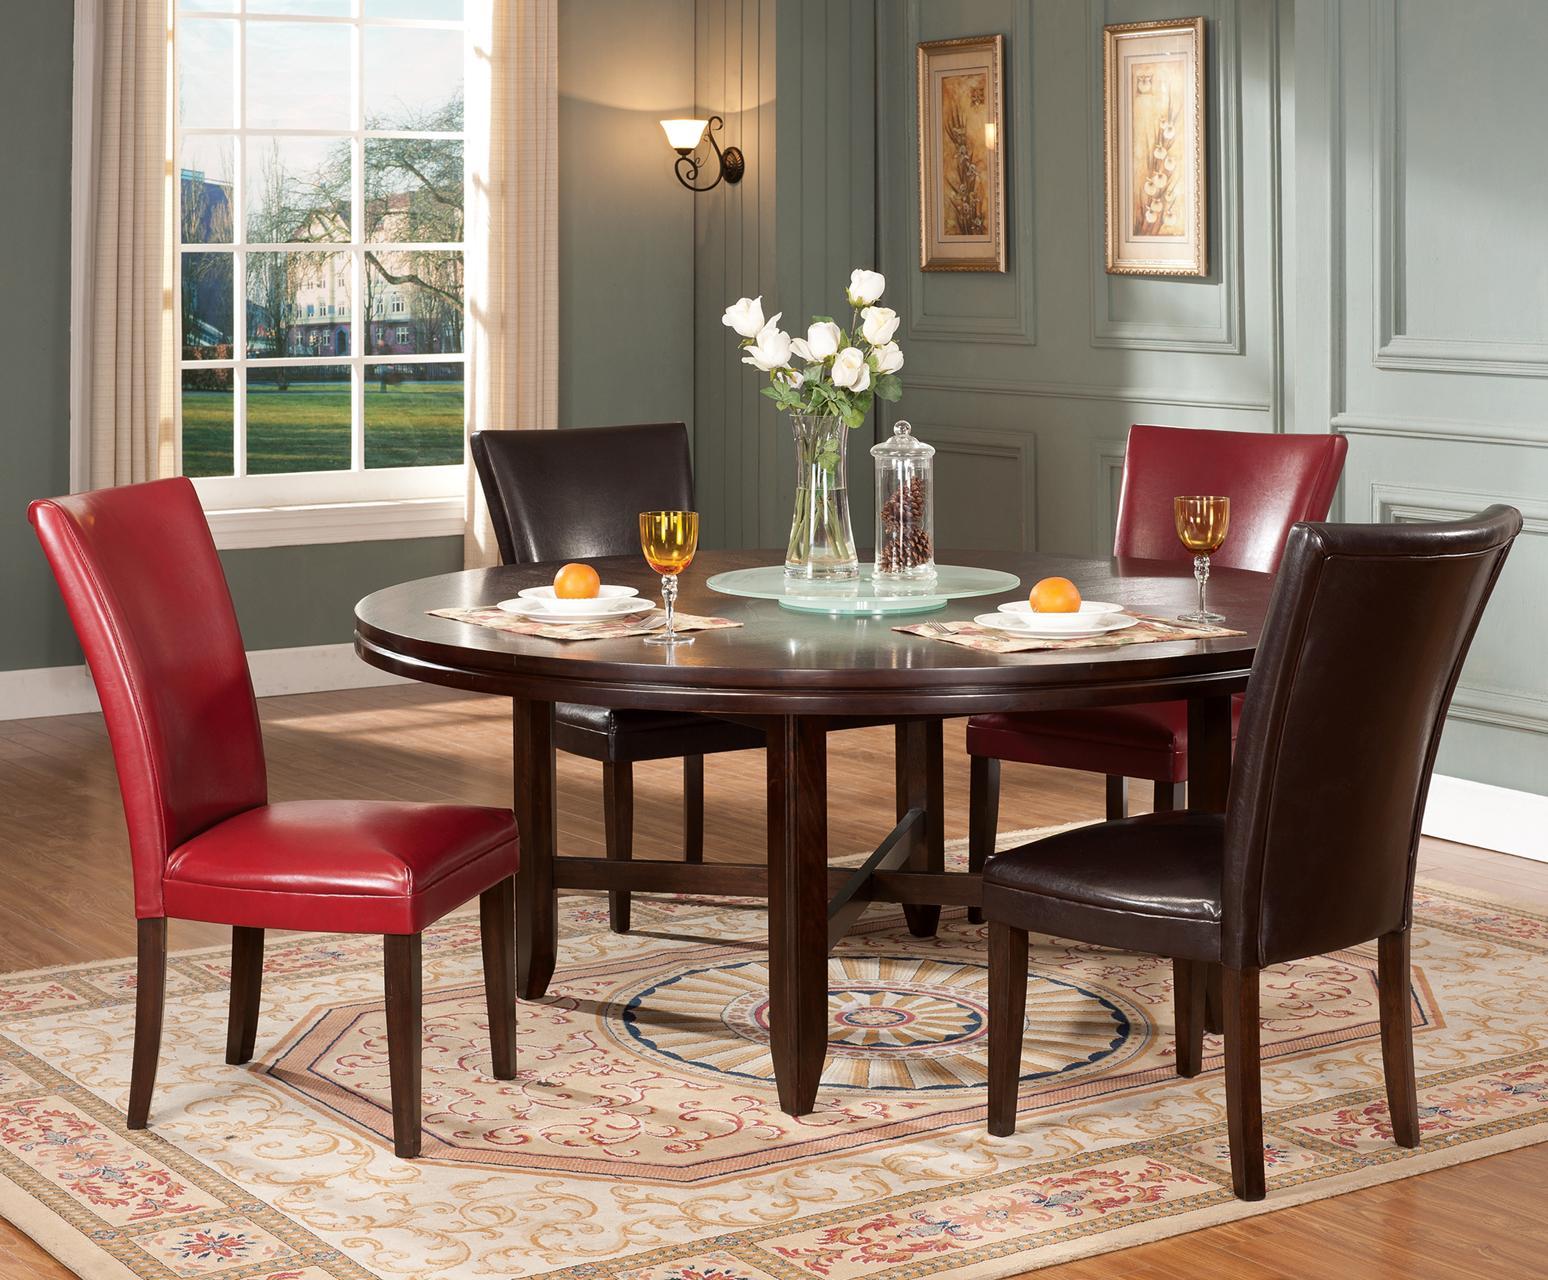 Hartford 5-Piece Dining Set by Steve Silver at Walker's Furniture